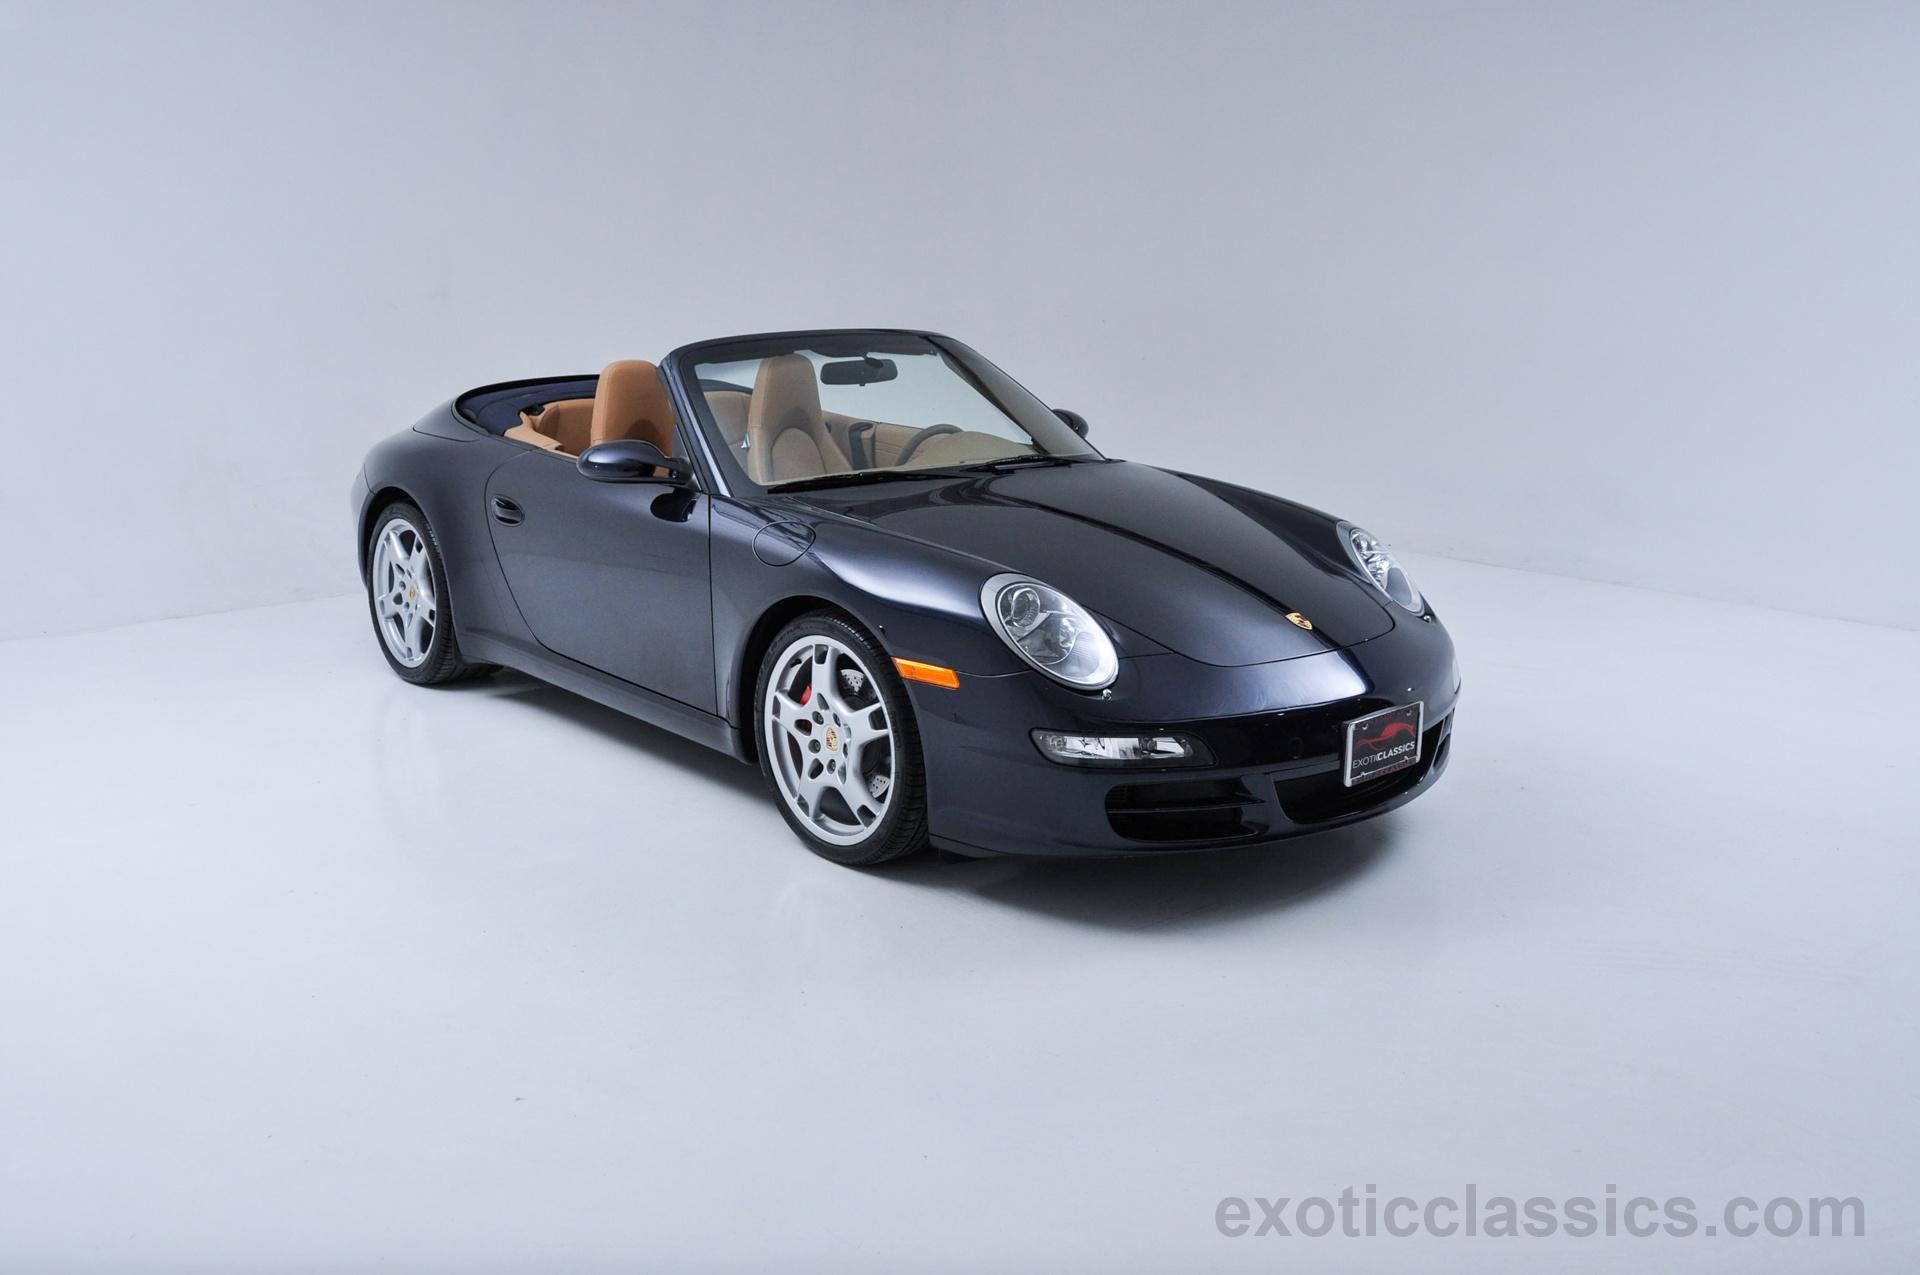 2006 Porsche C2S Convertible C2S - Exotic and Classic Car ...